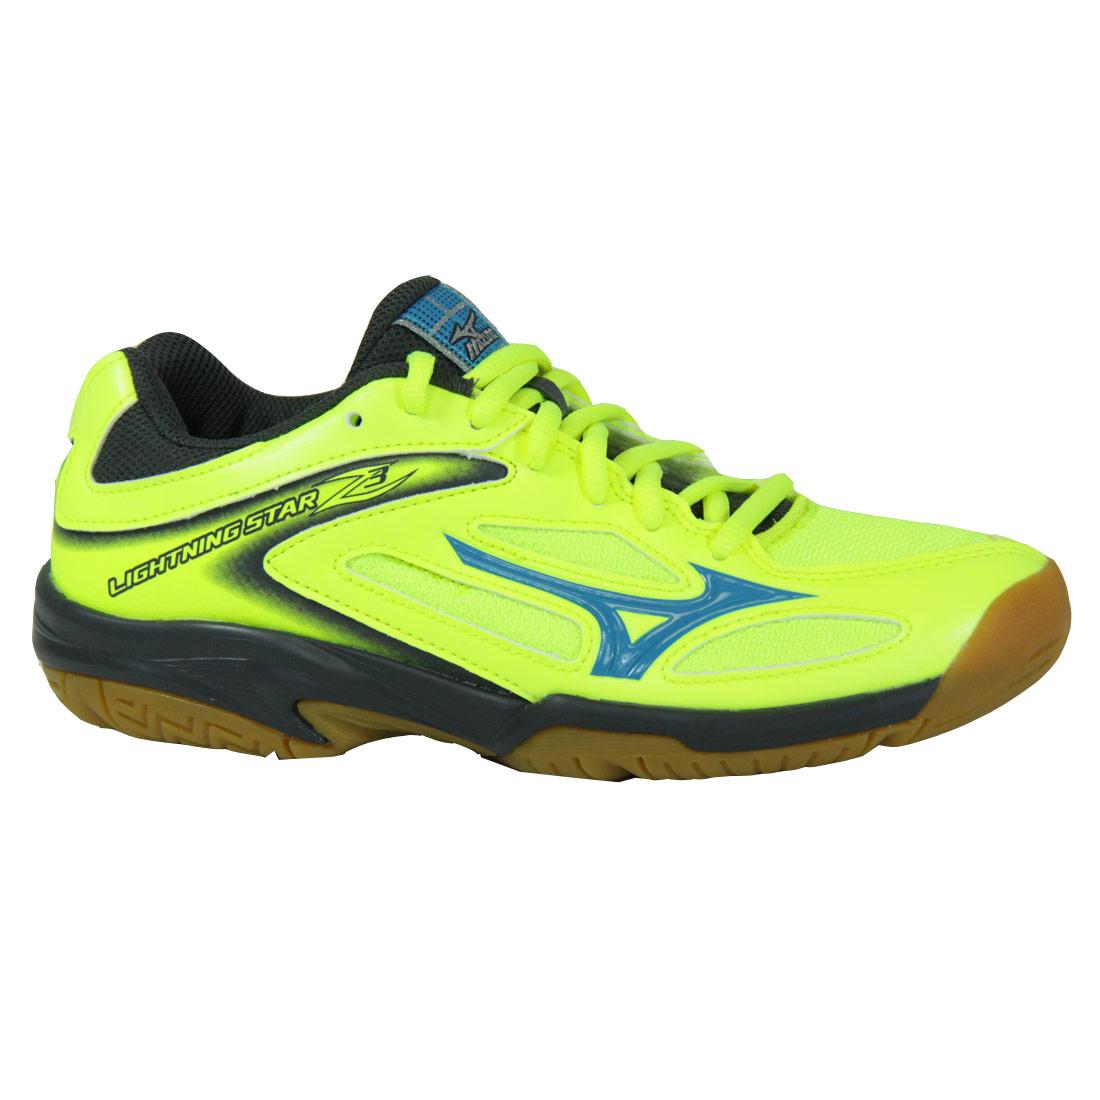 Mizuno Lightning Star Z5 Jr Chaussures de Volleyball Mixte Enfant